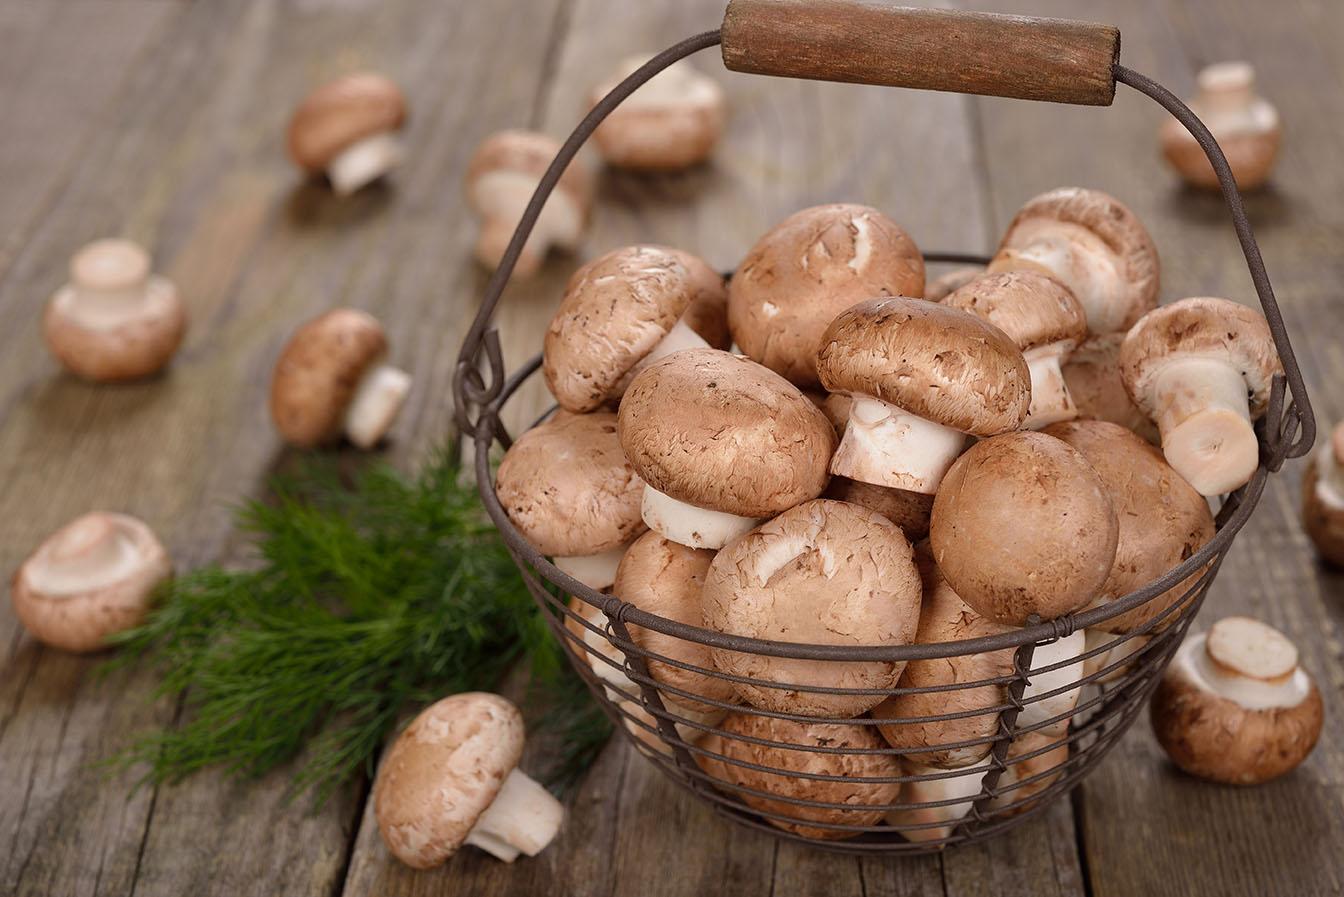 Mushroom equipment